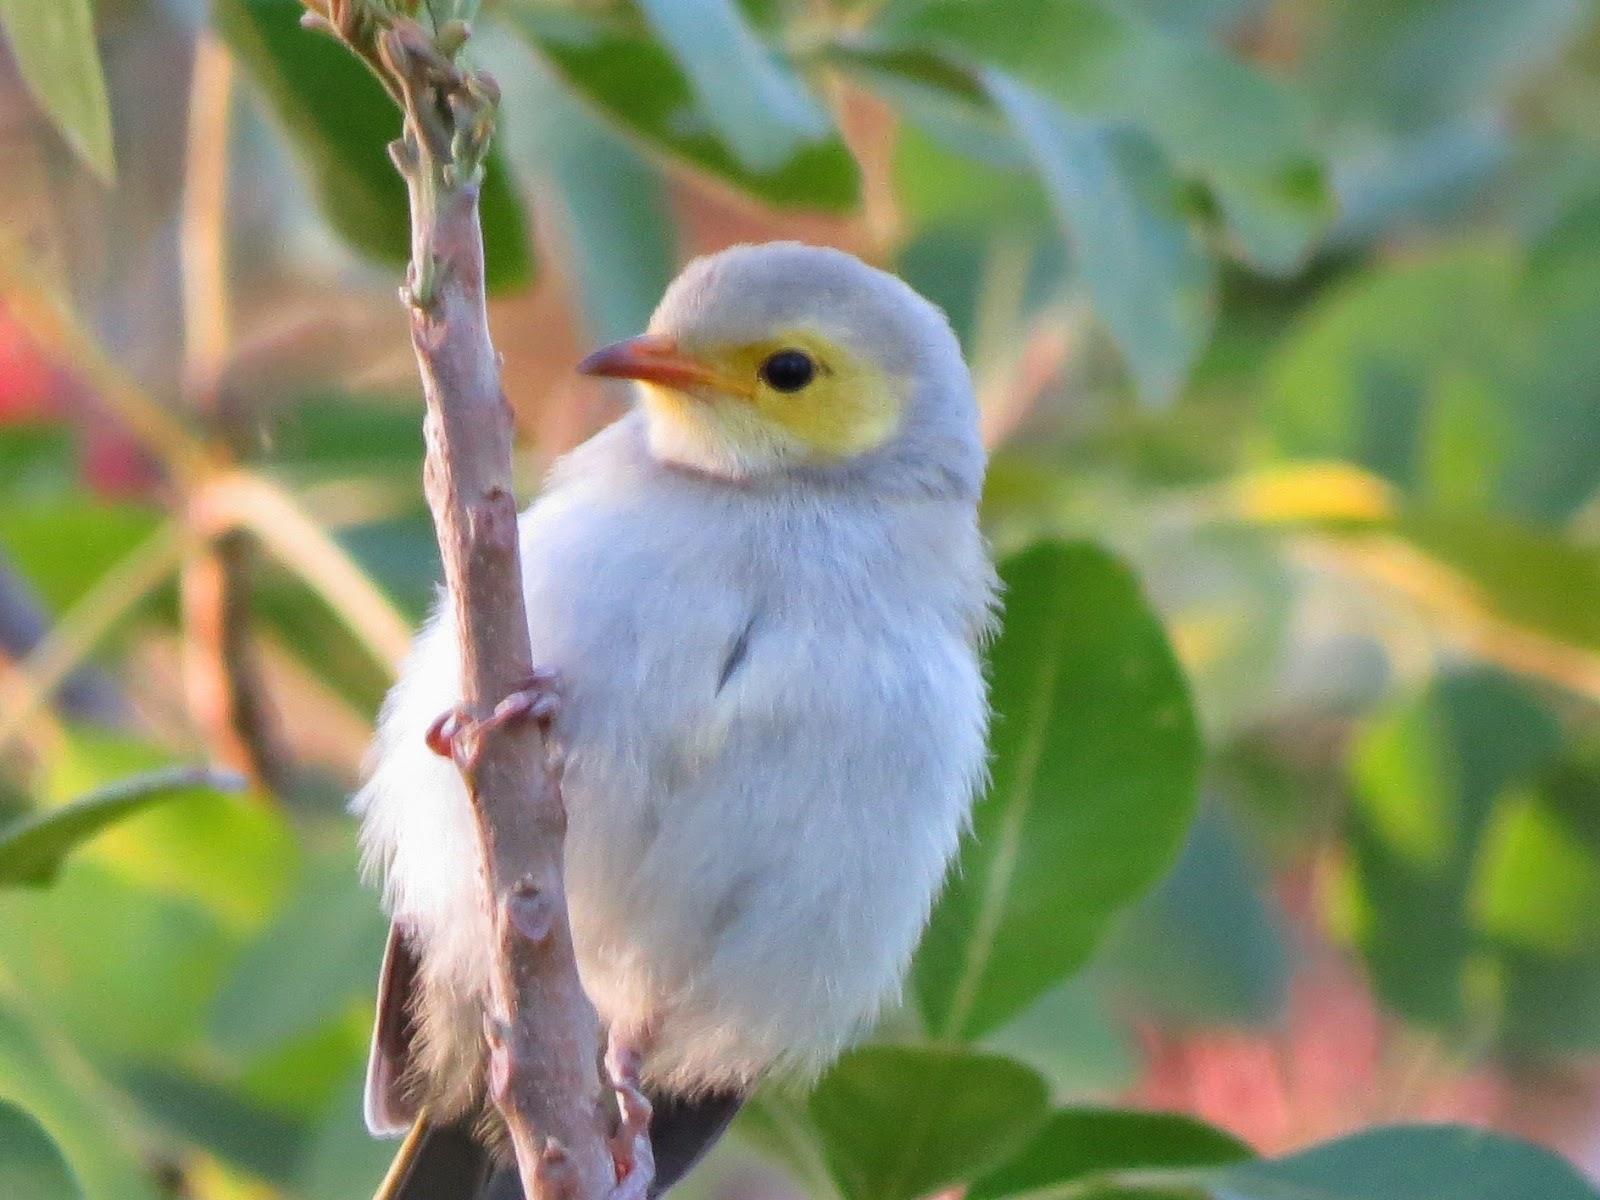 moses waring u0027s birds of australia bird photos from around alice